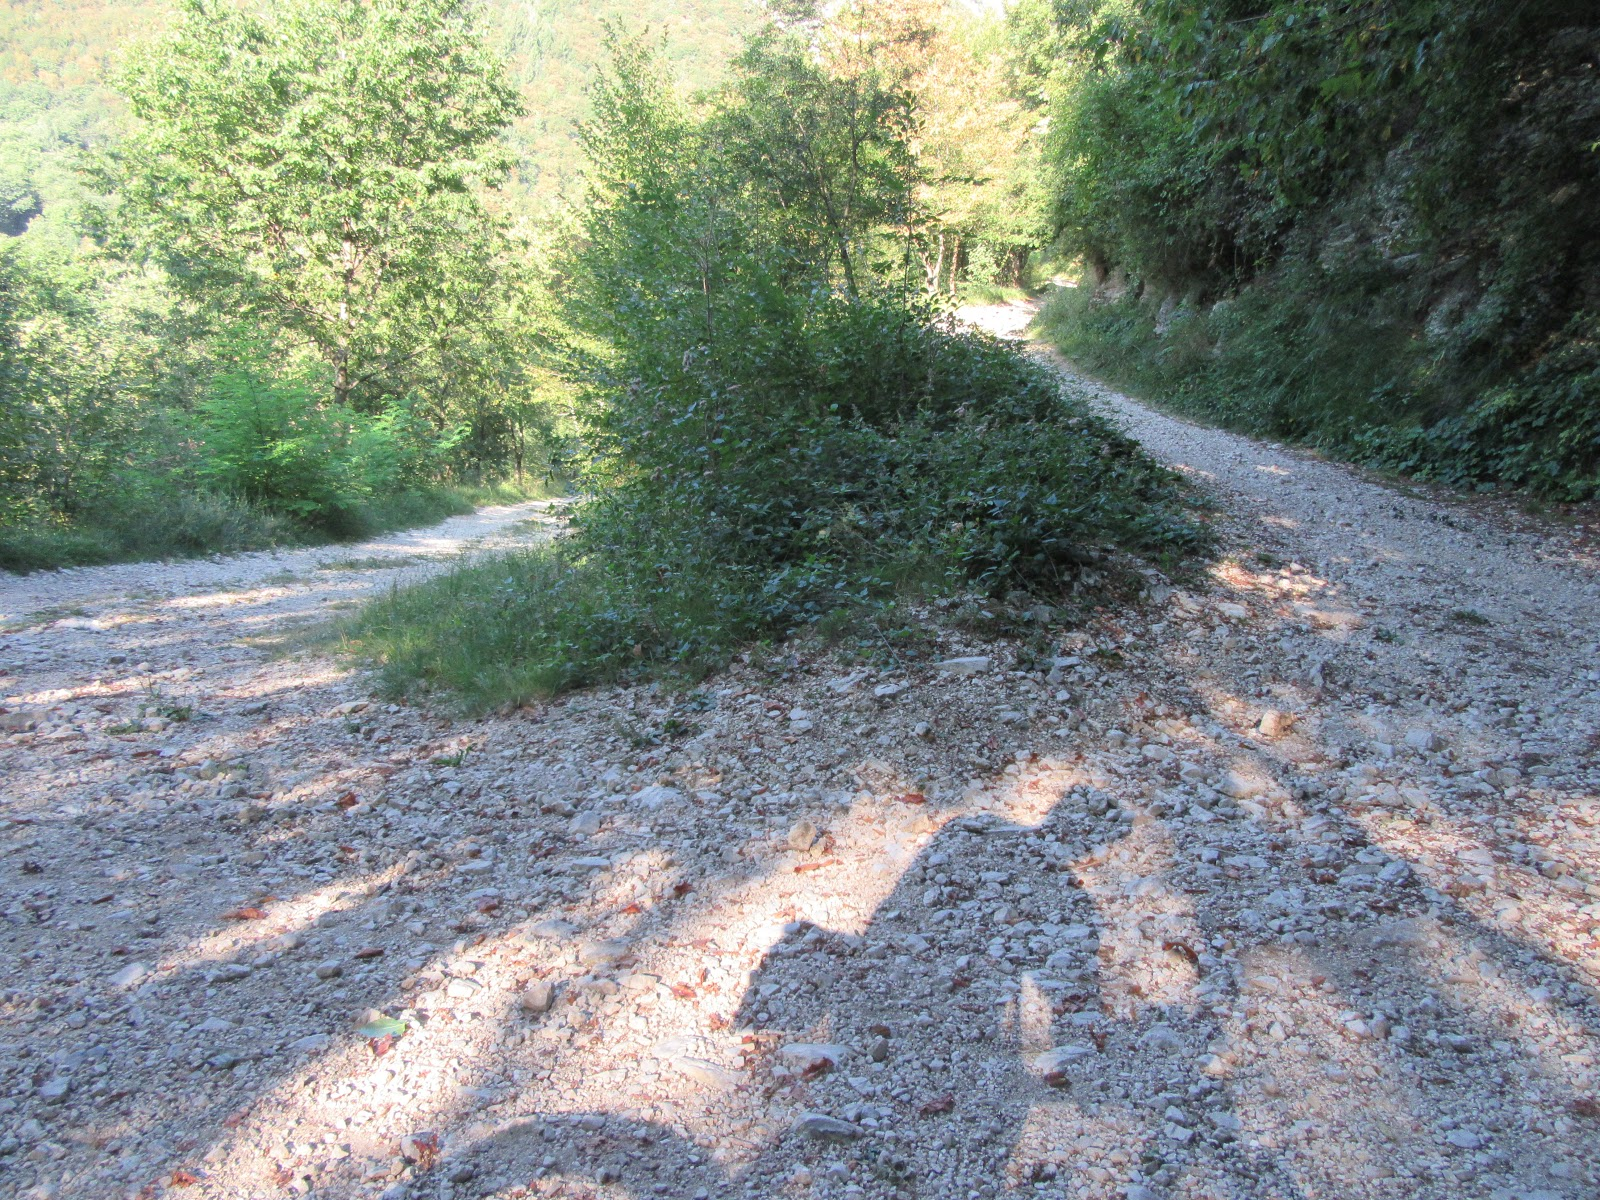 Climbing Monte Grappa from Crespano - gravel hairpin